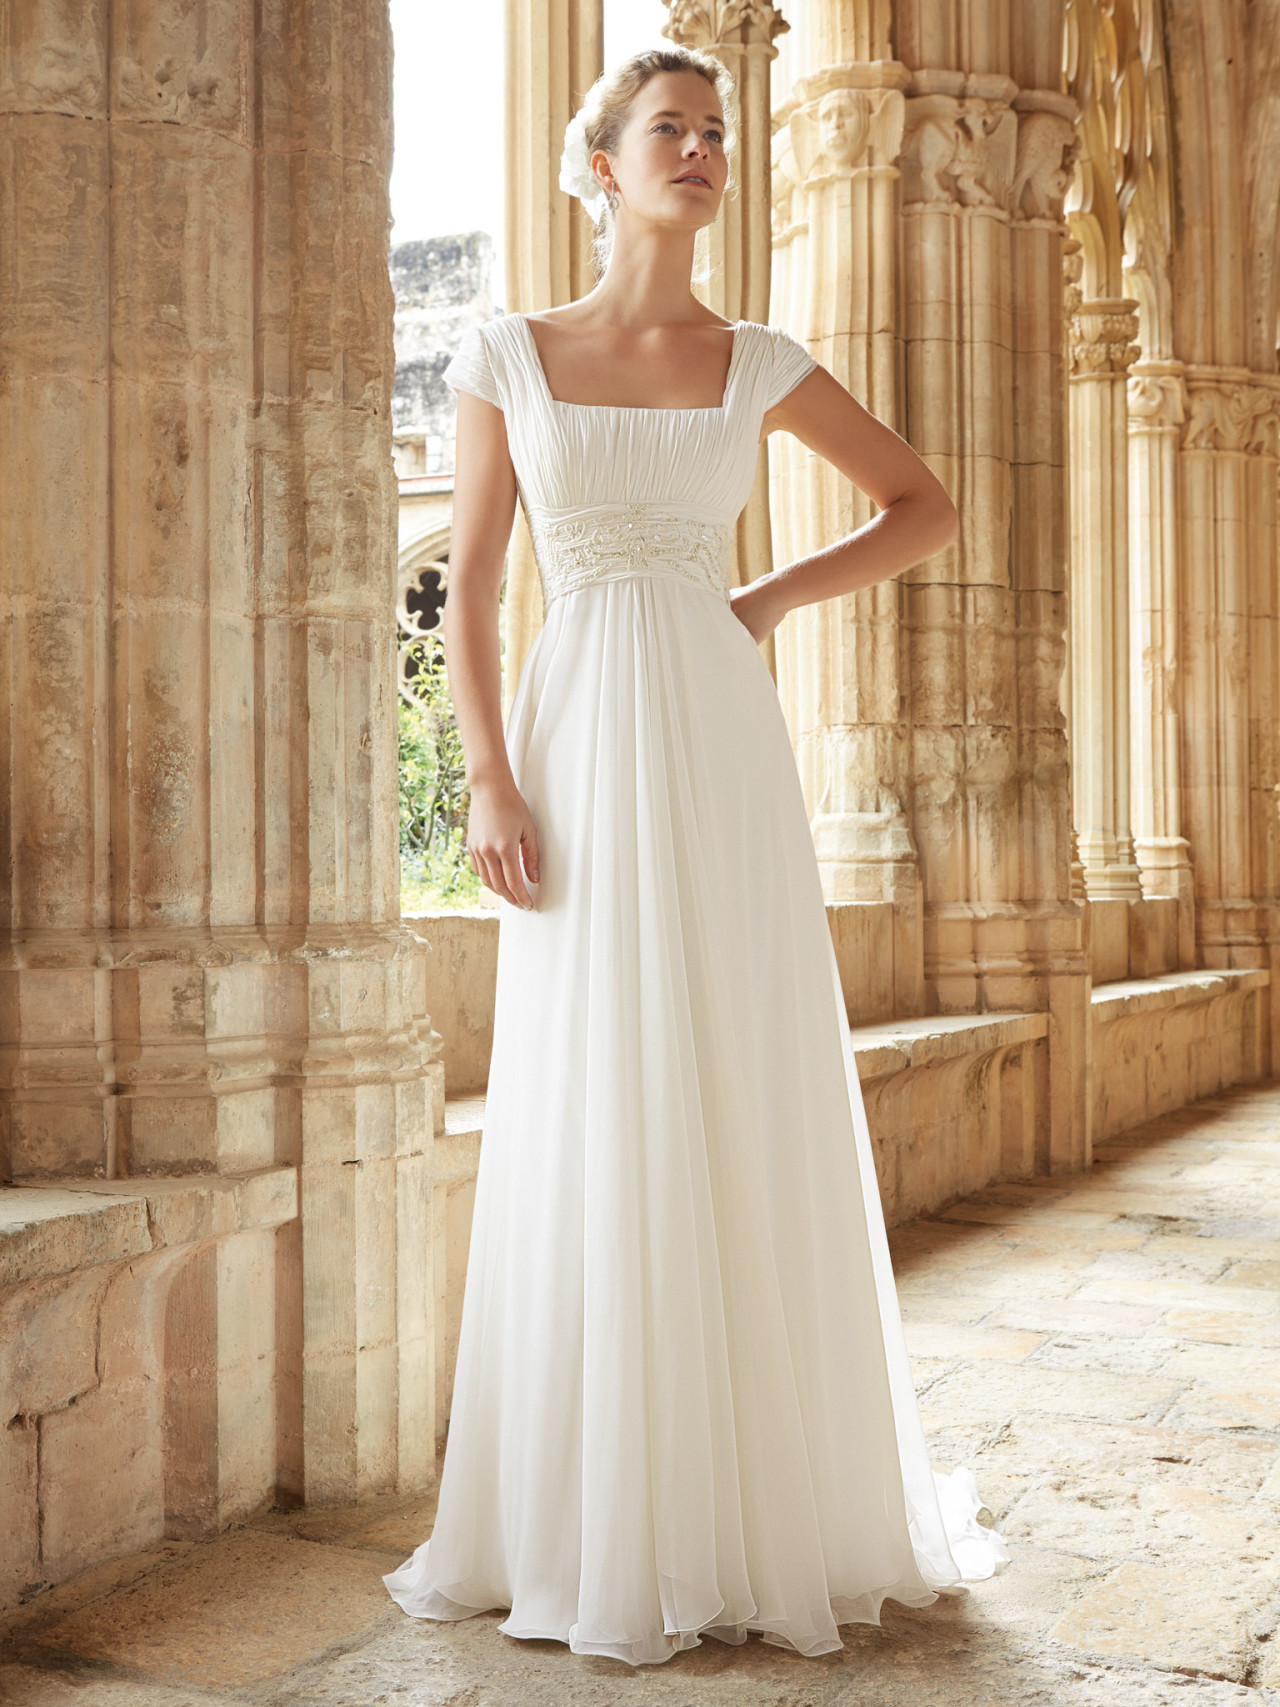 brudekjoler 2015 raimon bund243 copenhagen bridal